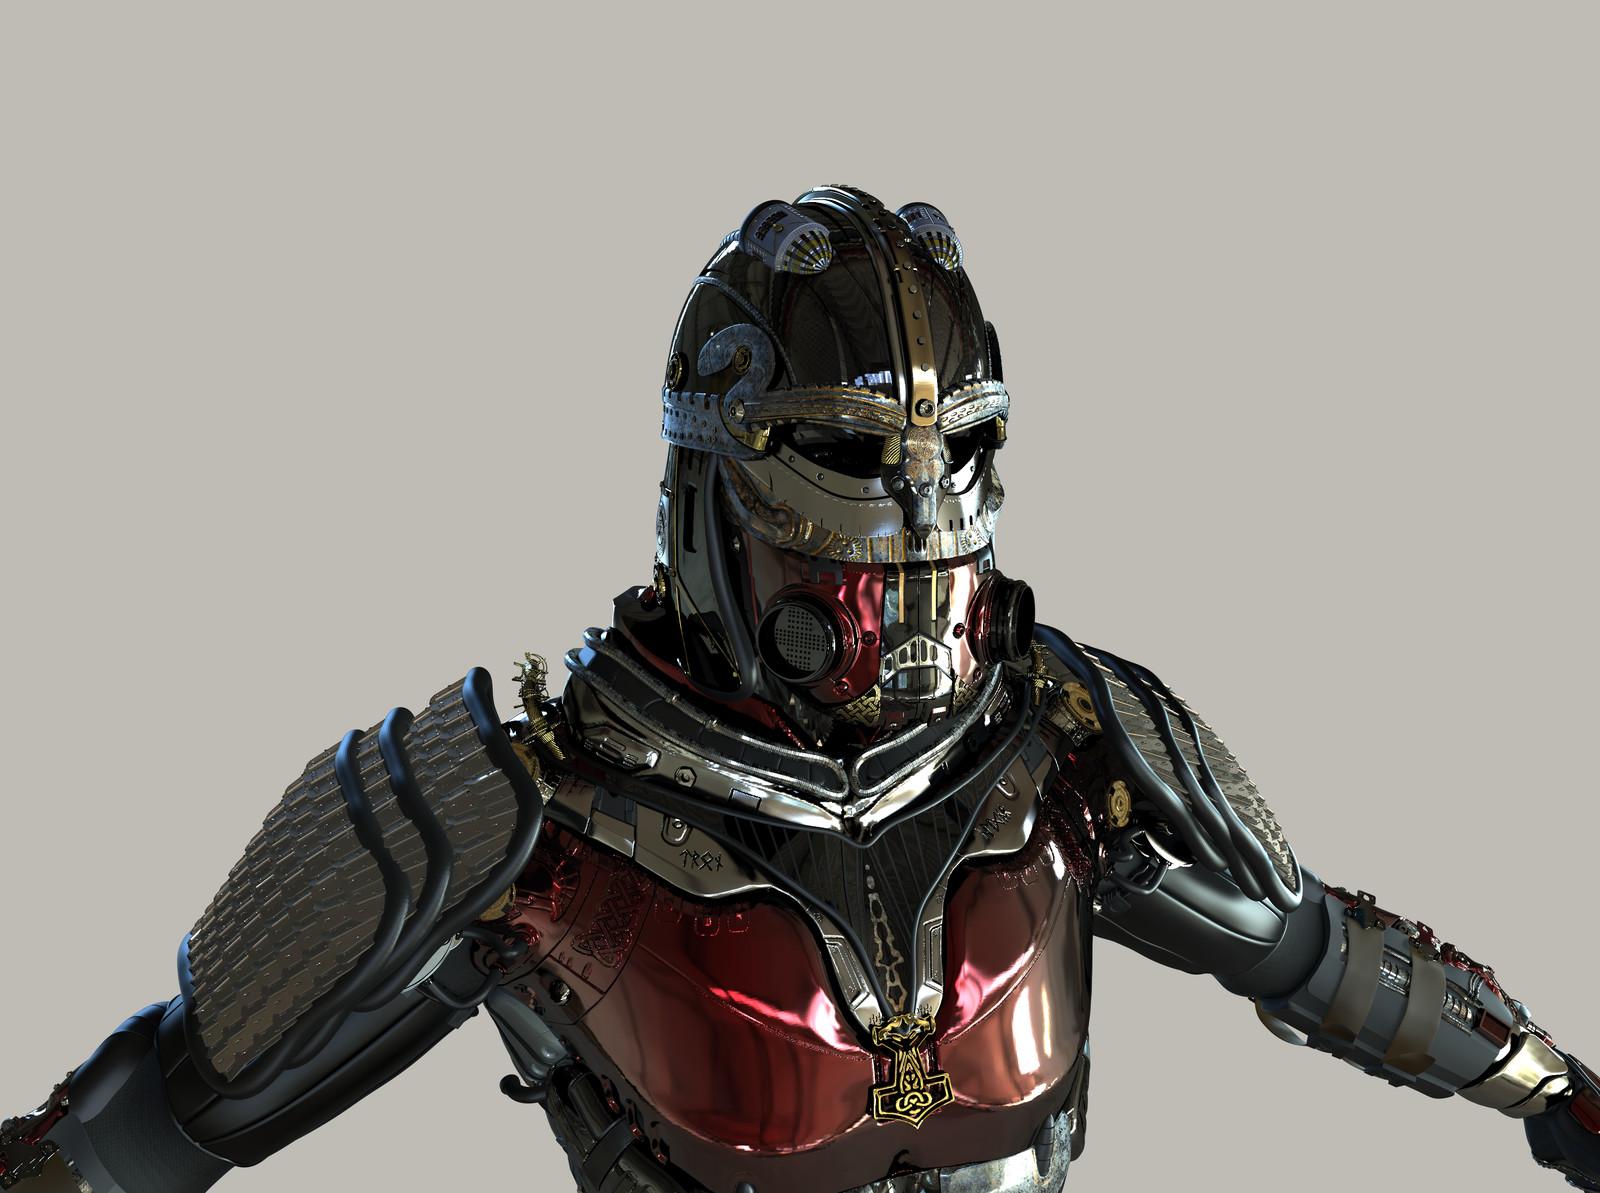 Futuristic Armor Viking based